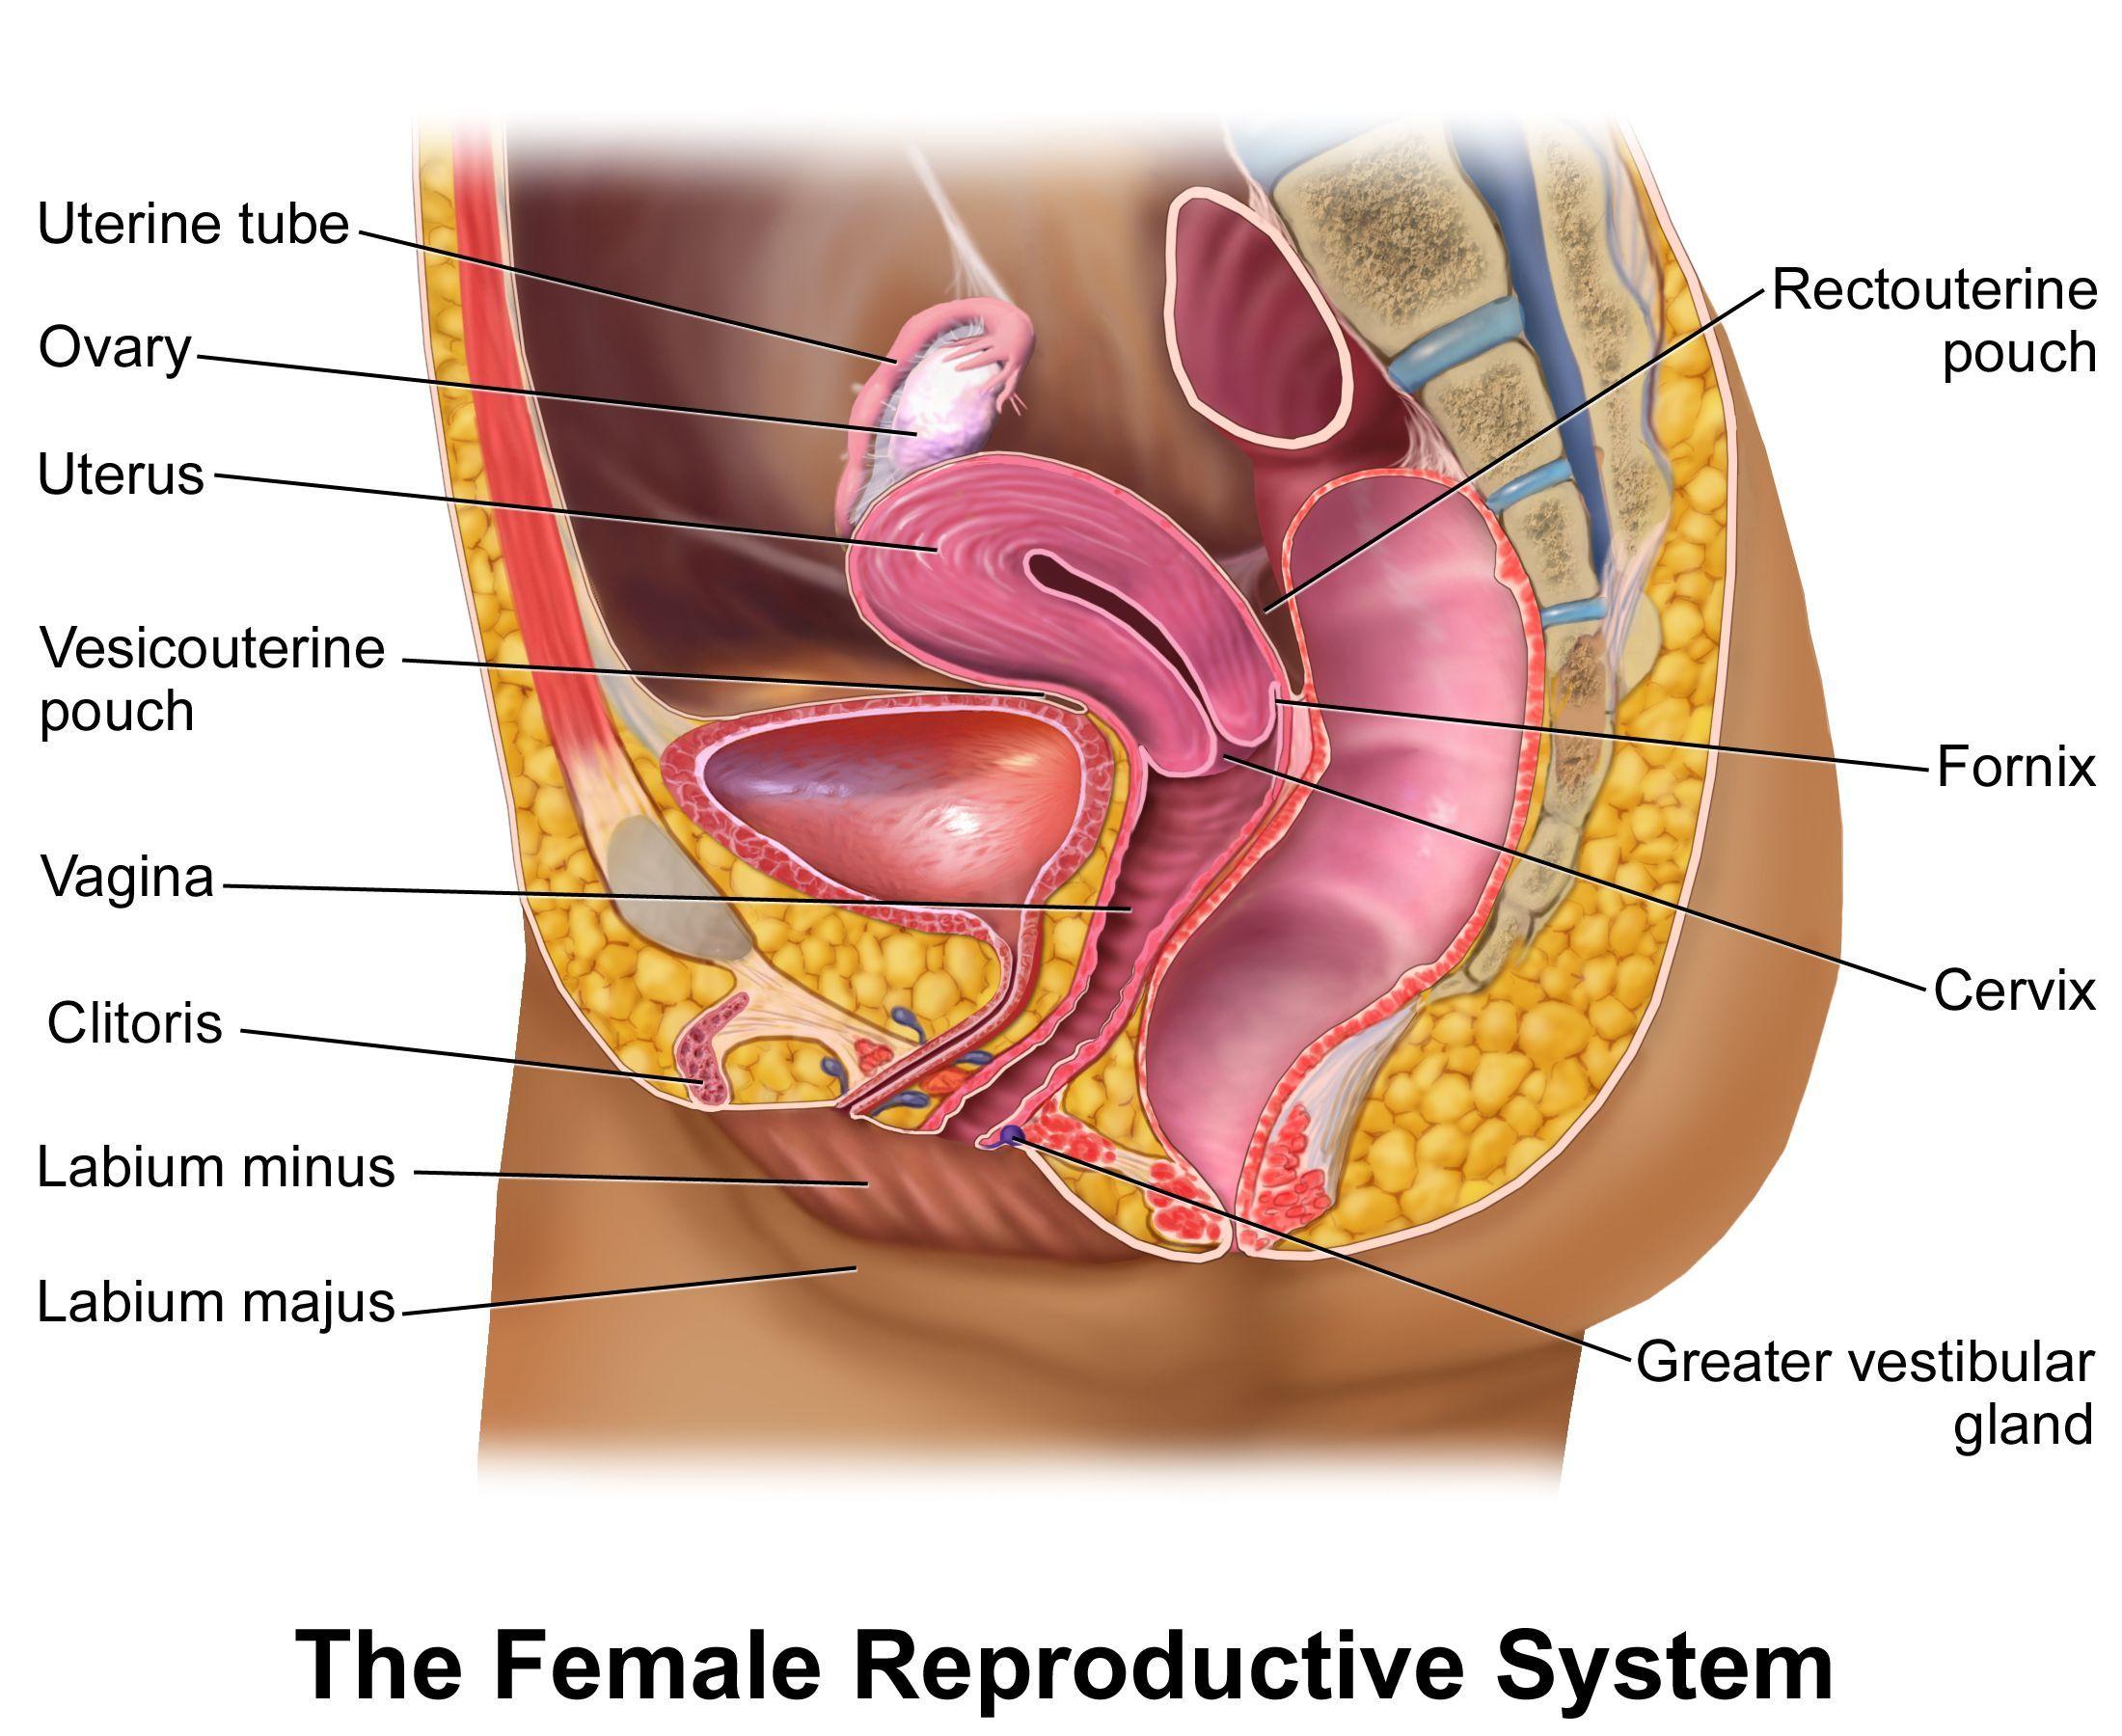 Internal Female Organs Diagram Internal Female Organs Diagram Female Reproductive System Reproductive System Female Reproductive System Human Anatomy Female